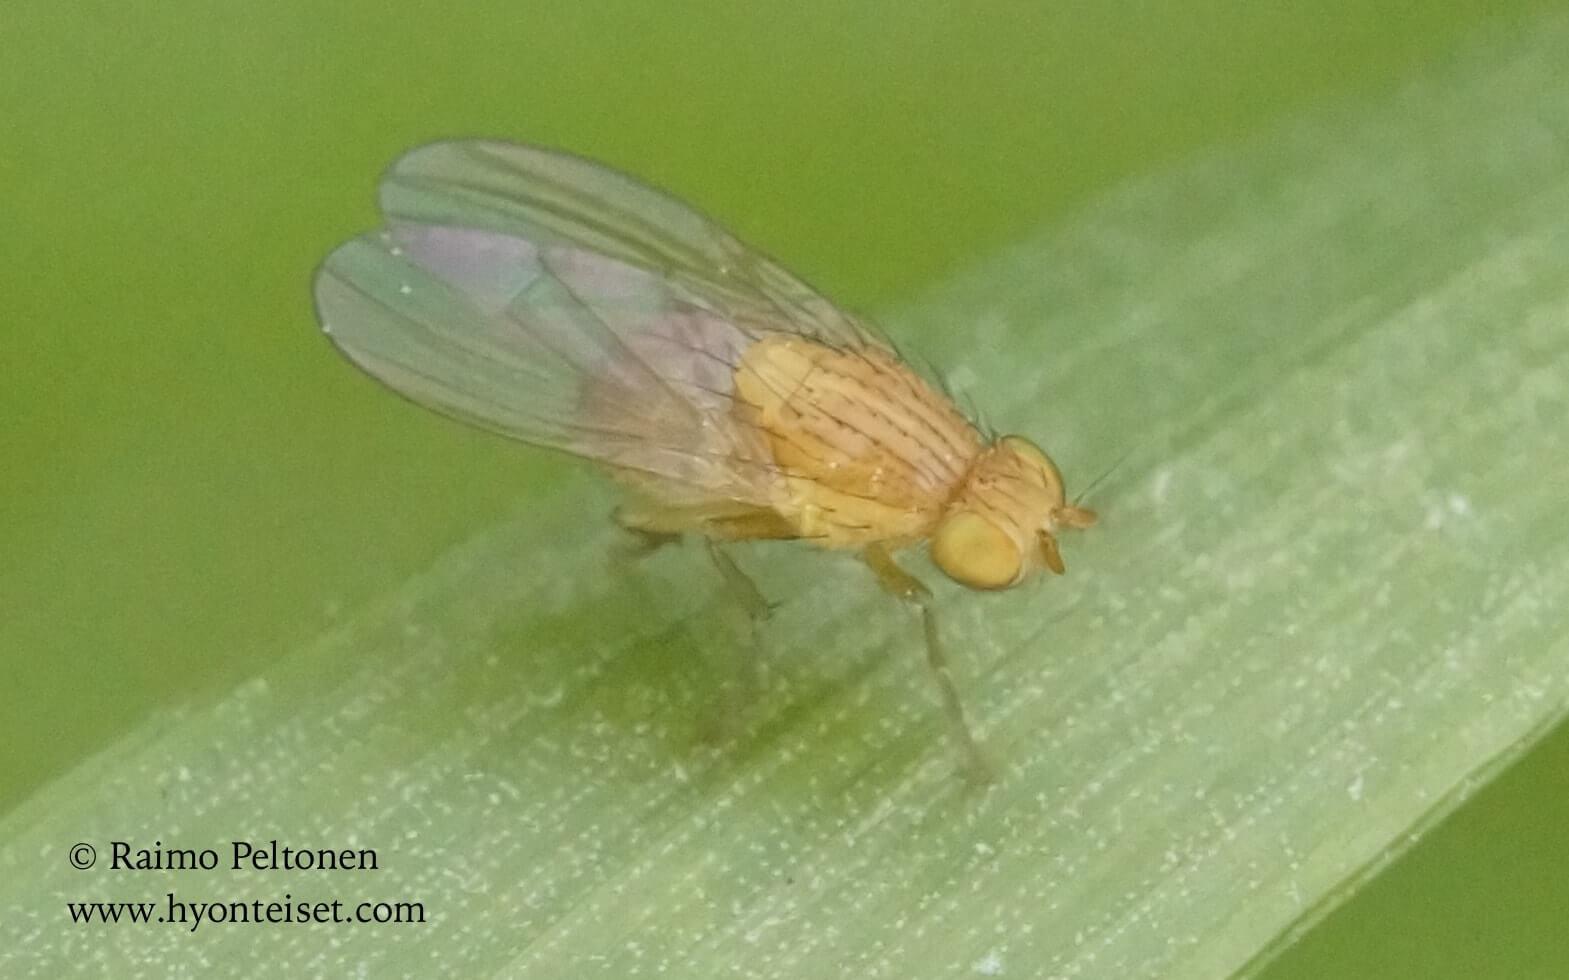 cf. Homoneura sp. (det. Paul Beuk)